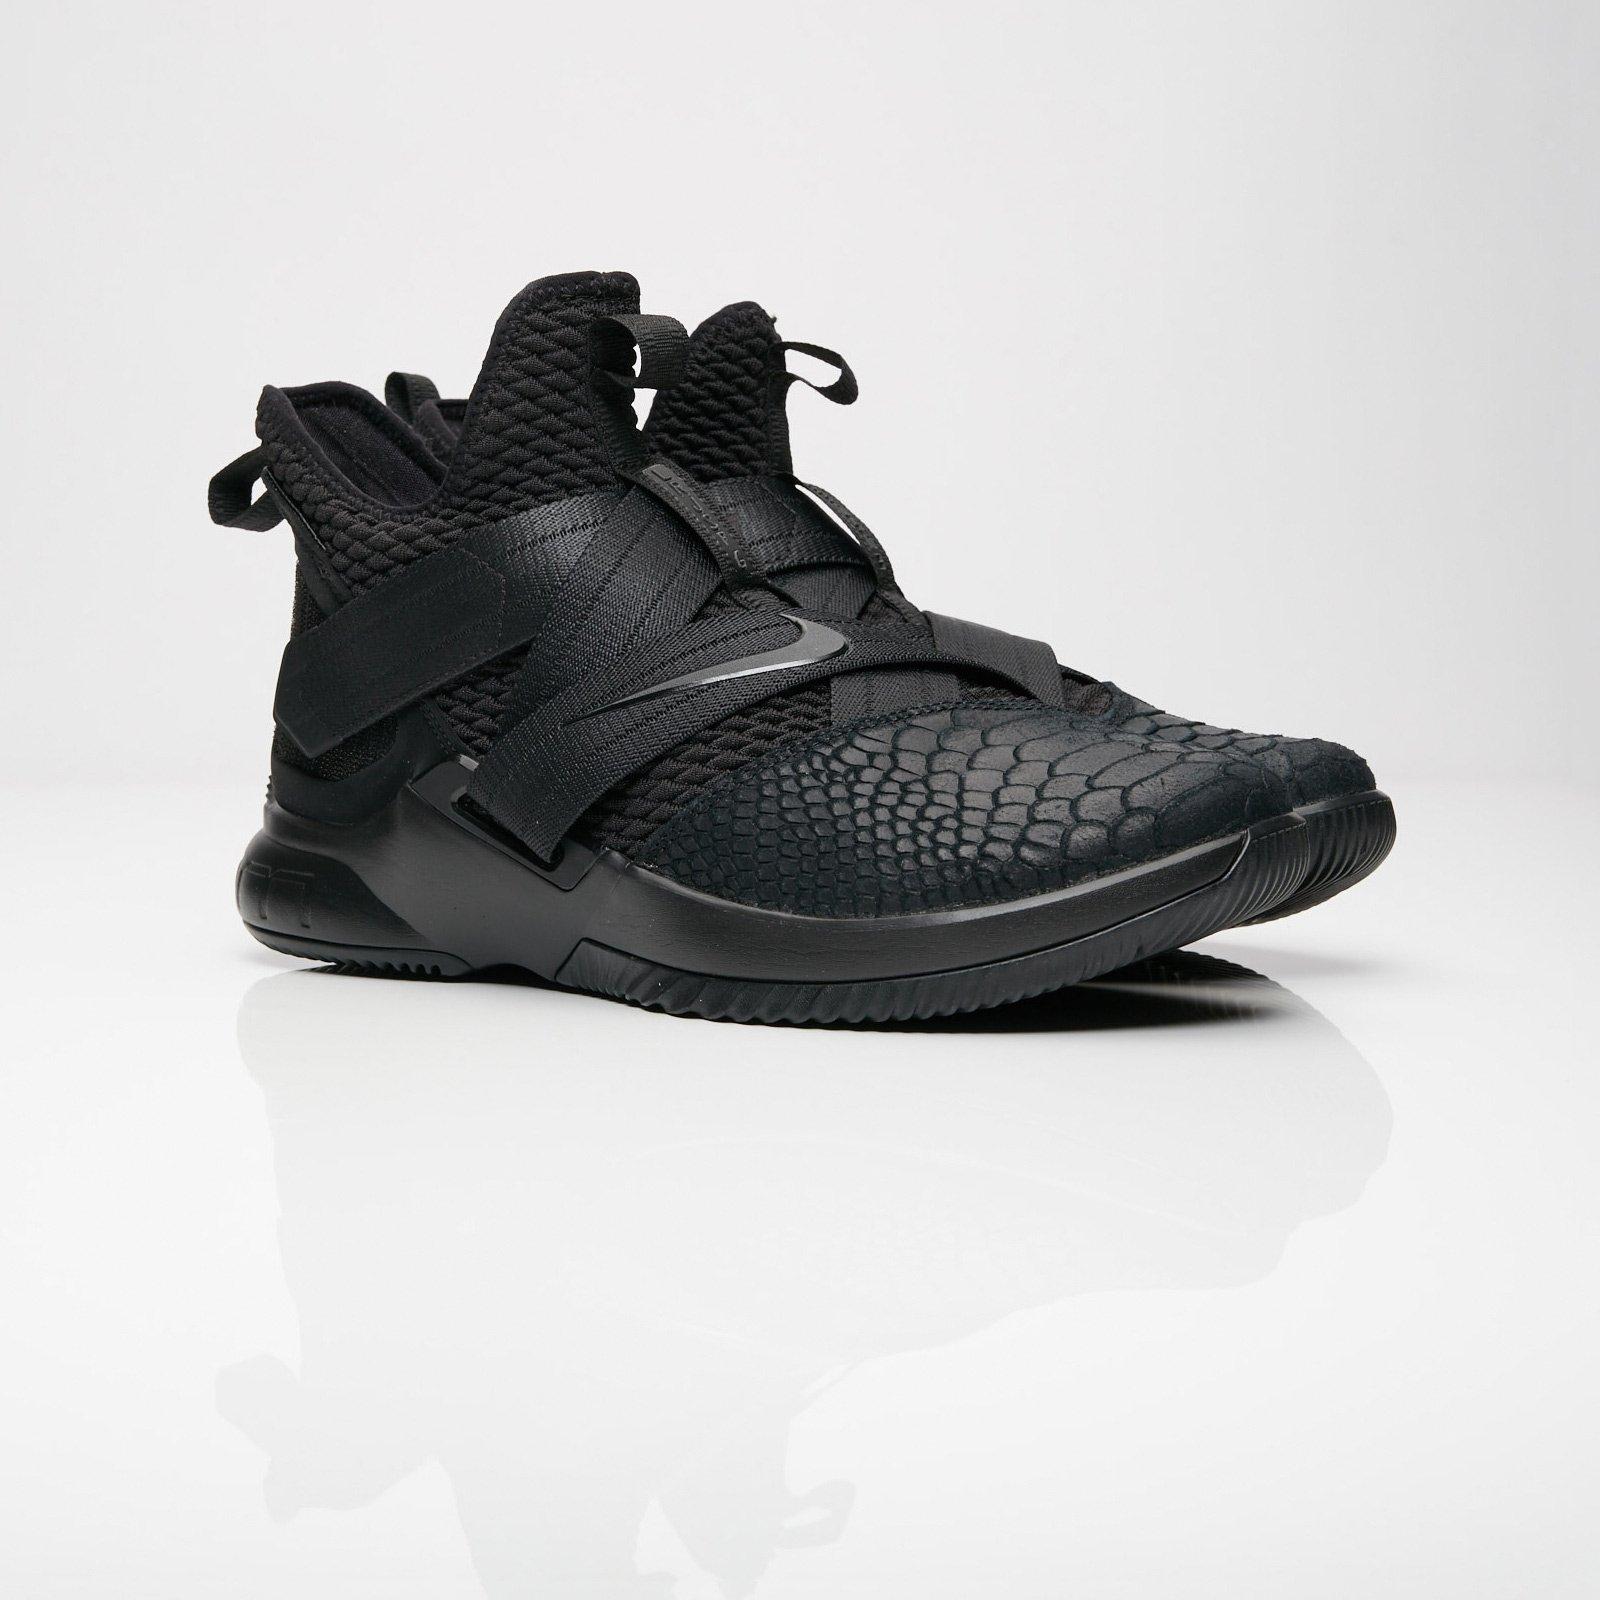 Nike Basketball Lebron Soldier XII SFG